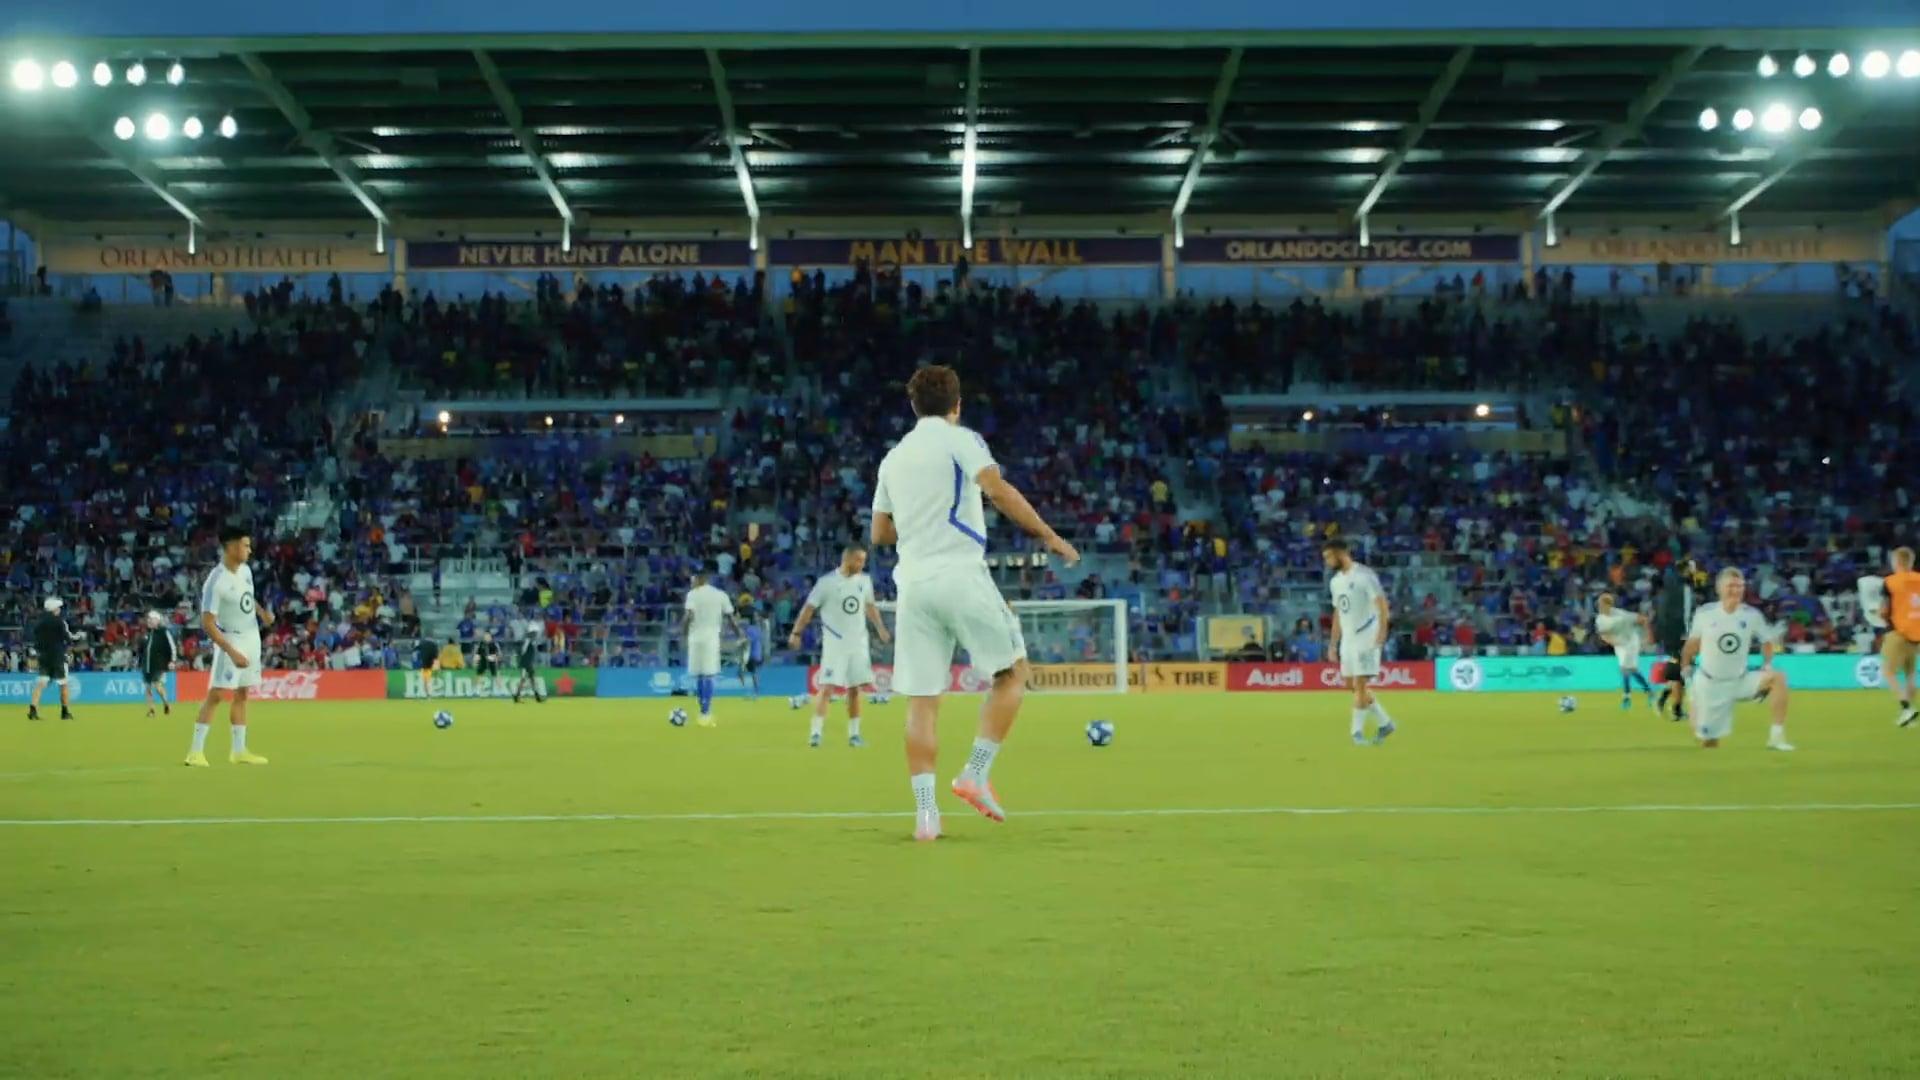 Jonathan Dos Santos x MLS All Star Week